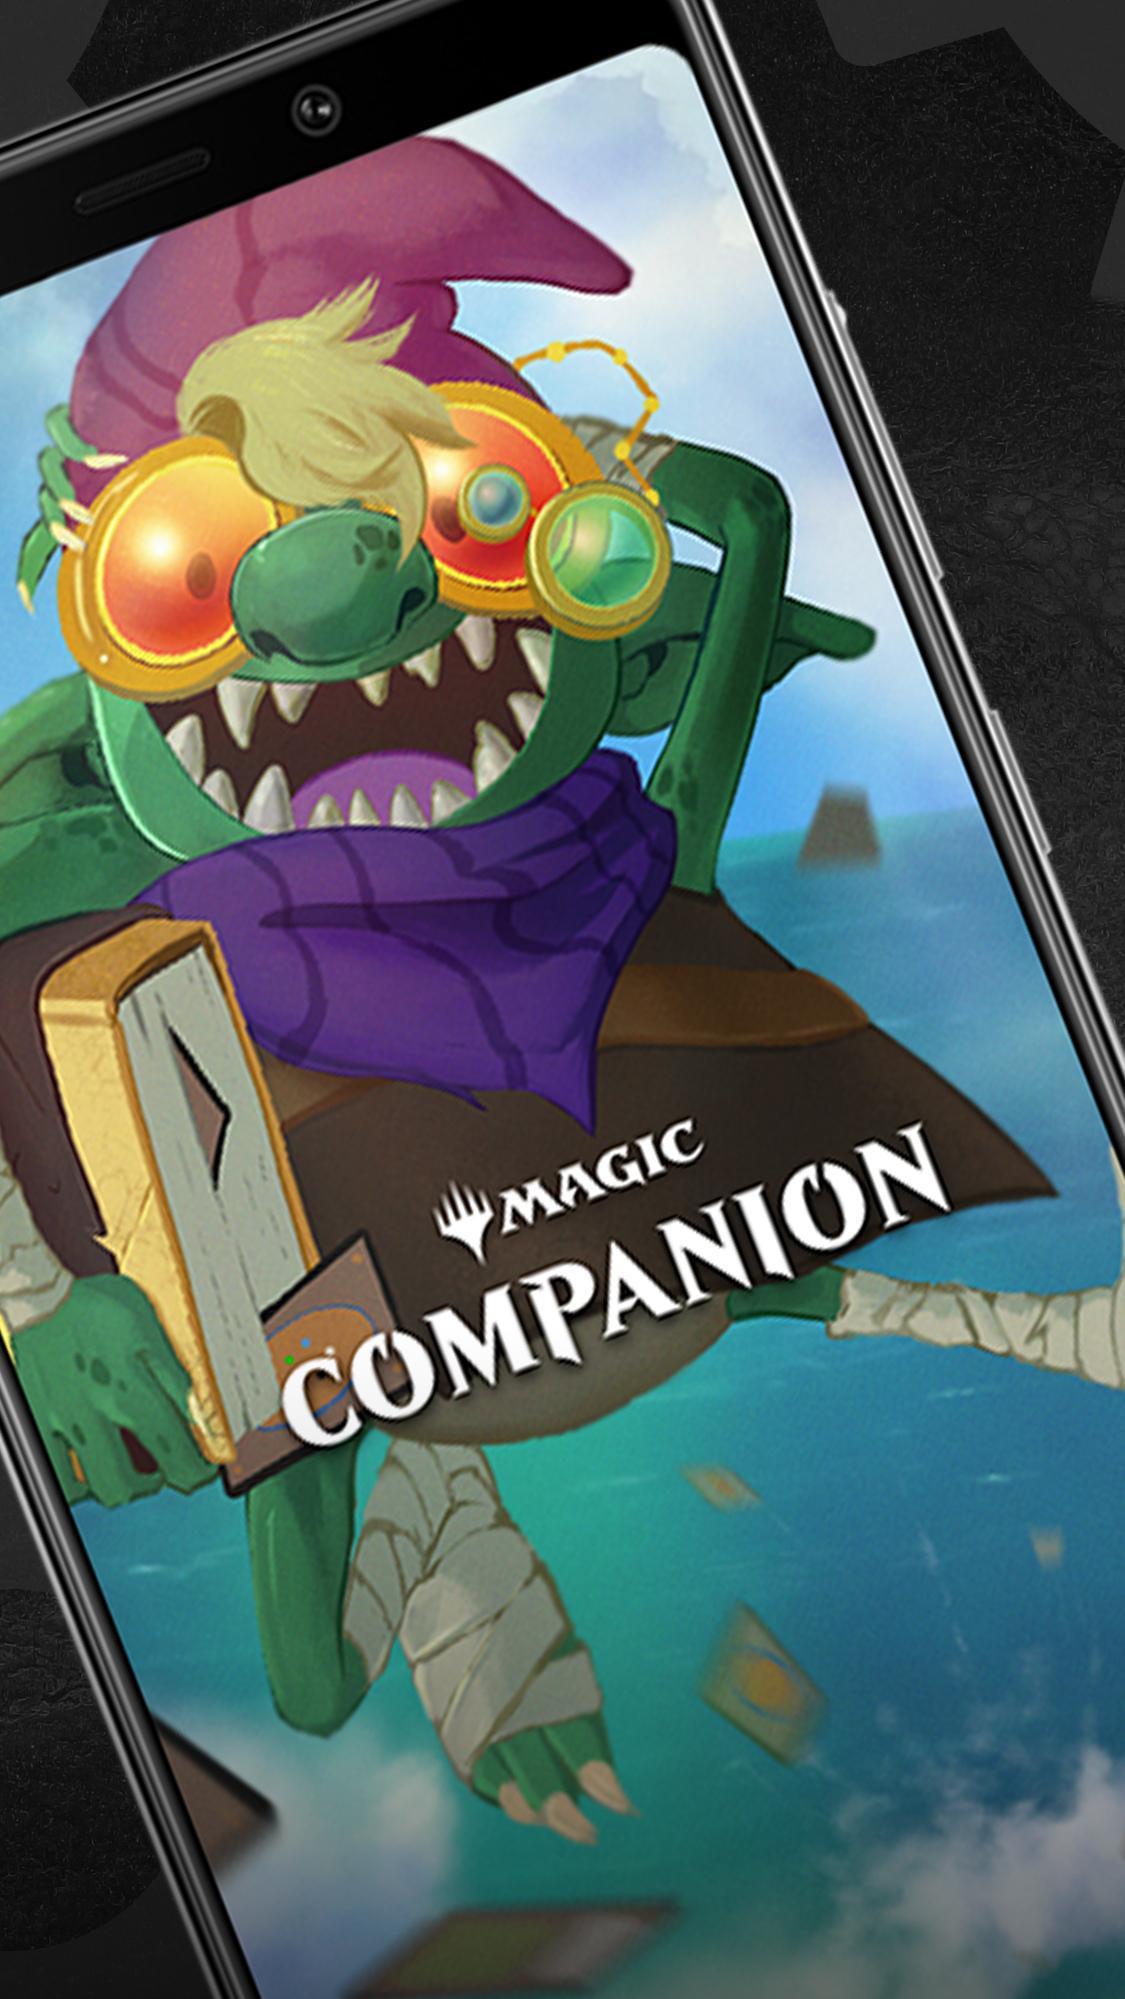 Magic: The Gathering Companion 1.0.48185 Screenshot 2